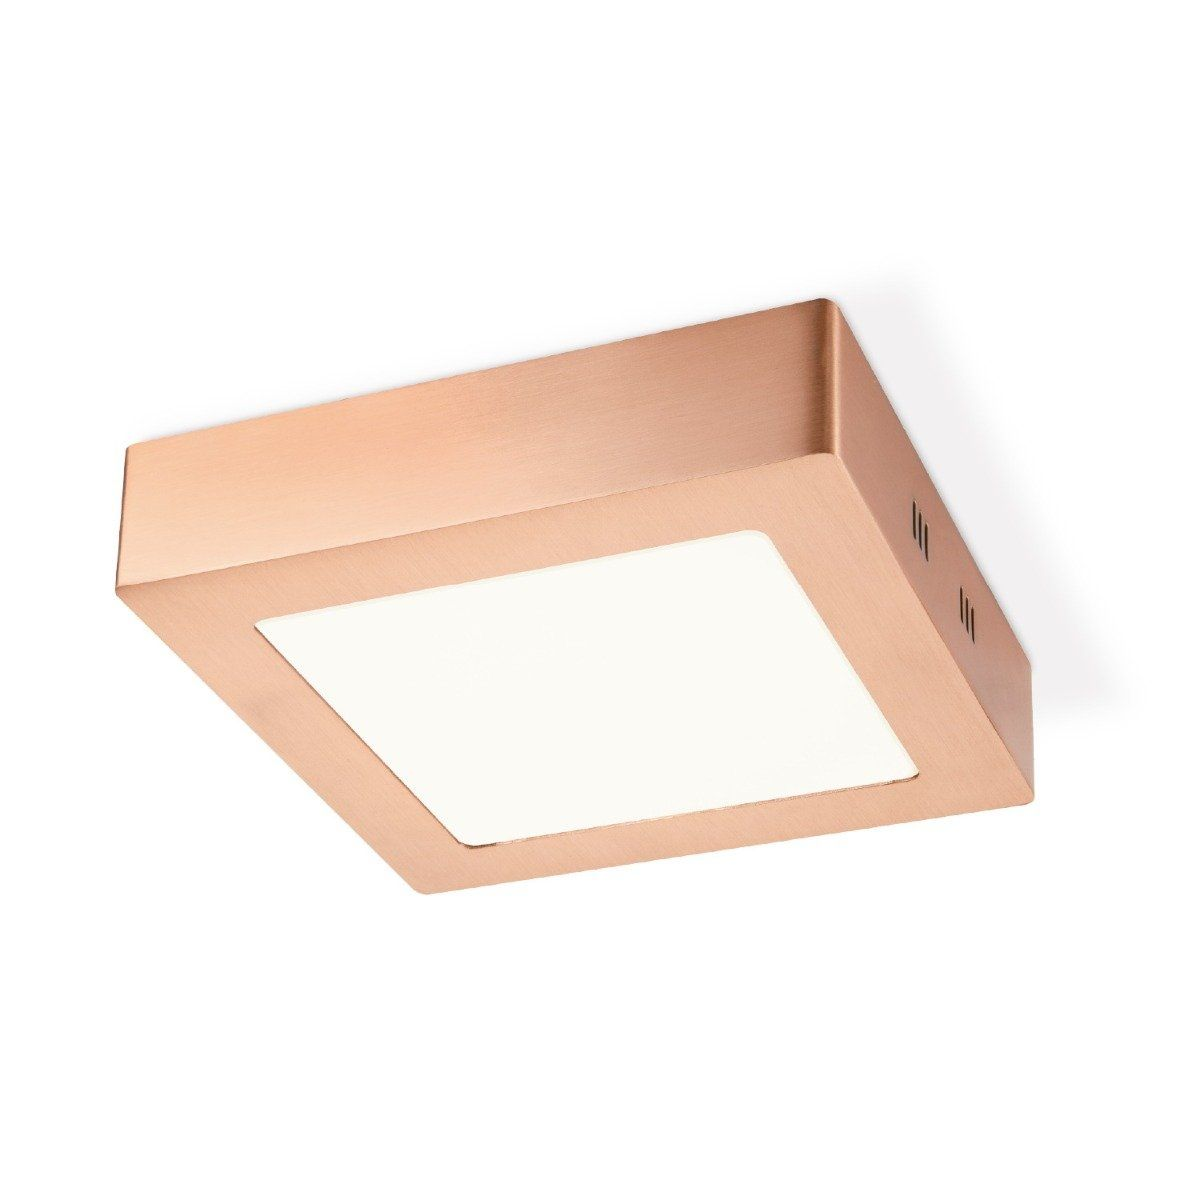 Home sweet home LED plafondlamp Ska vierkant 17 - koper